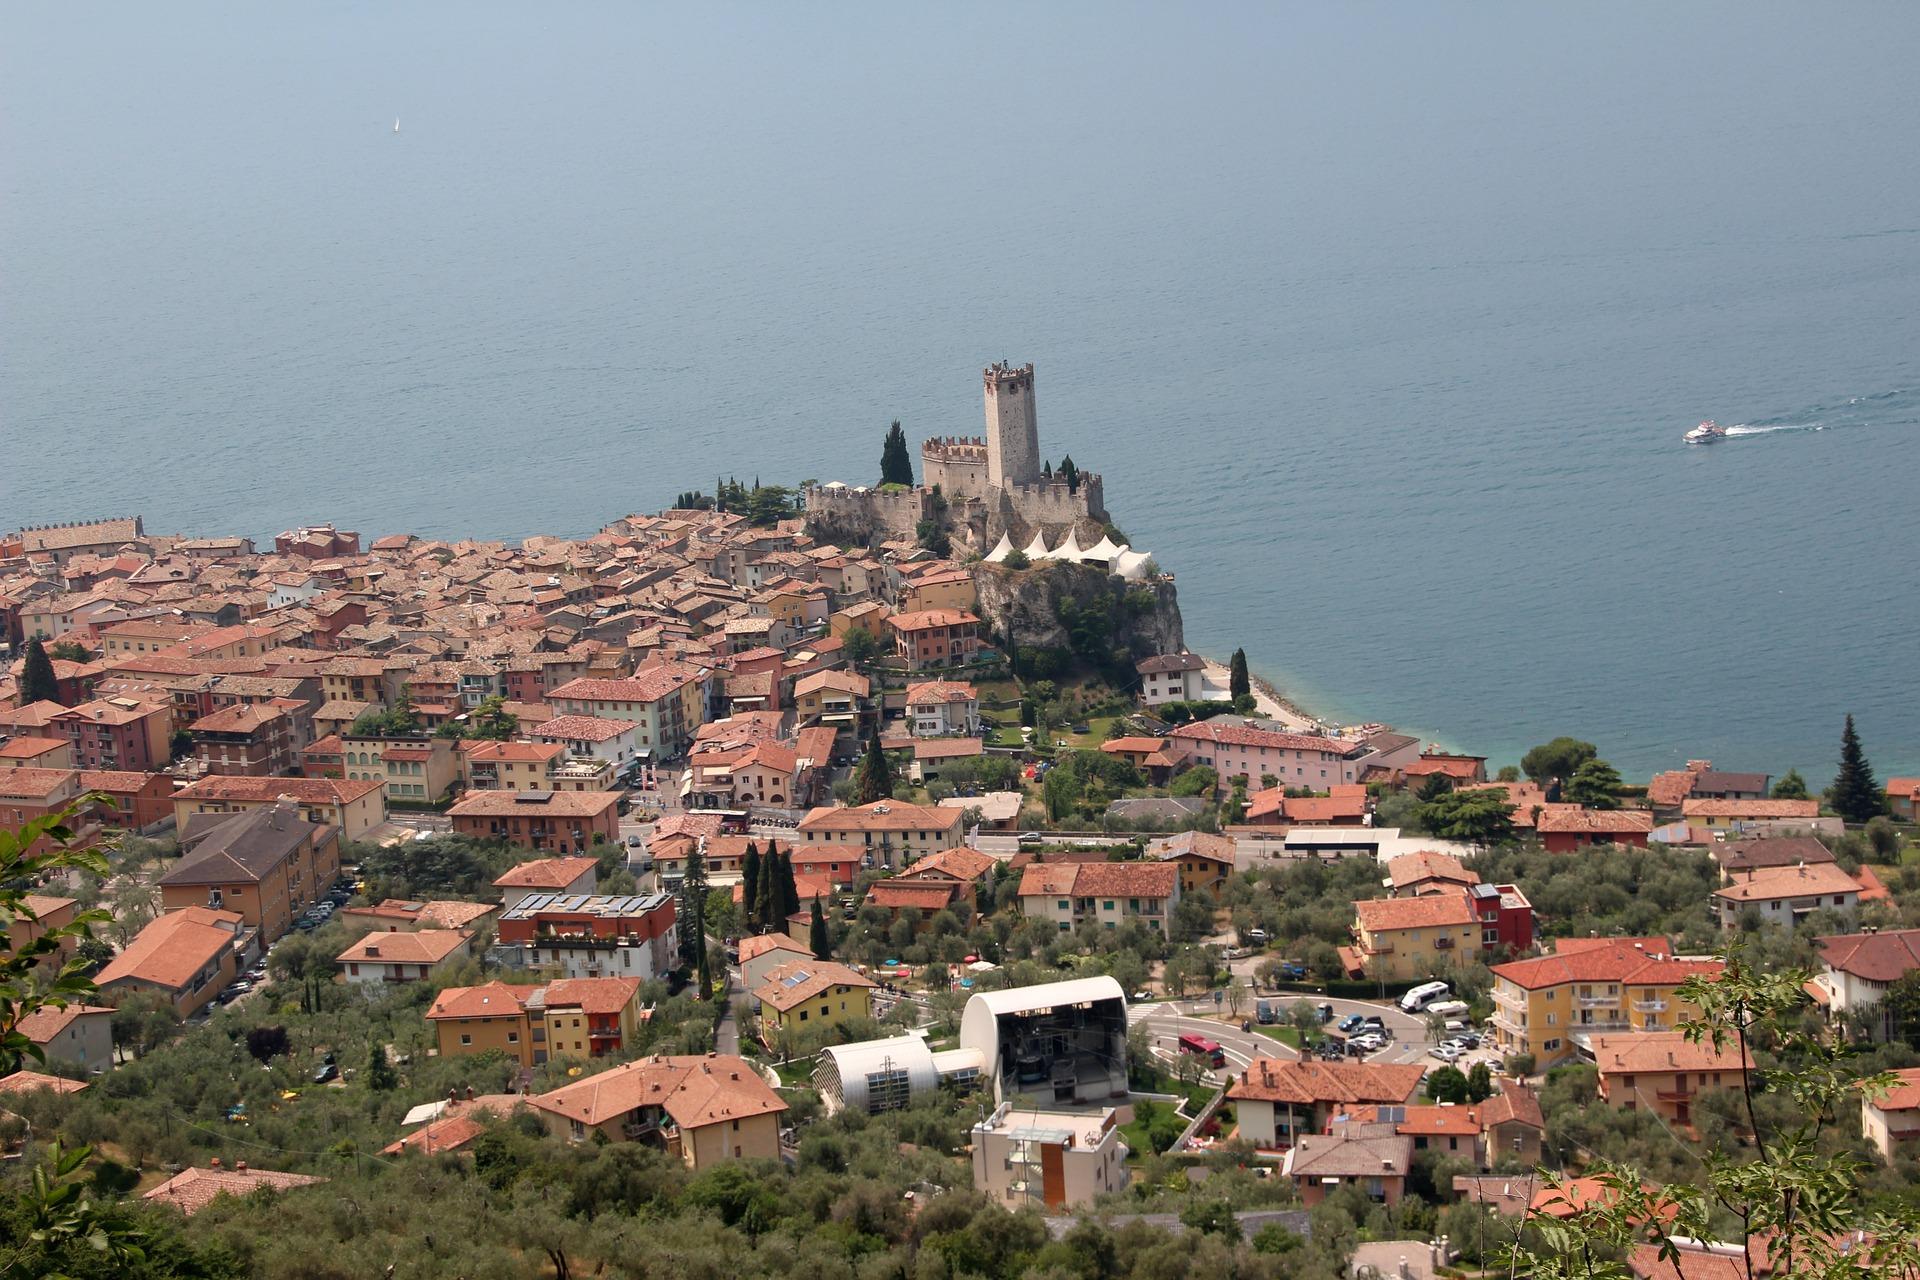 castello_malcesine_panorama_lago_di_garda.jpg